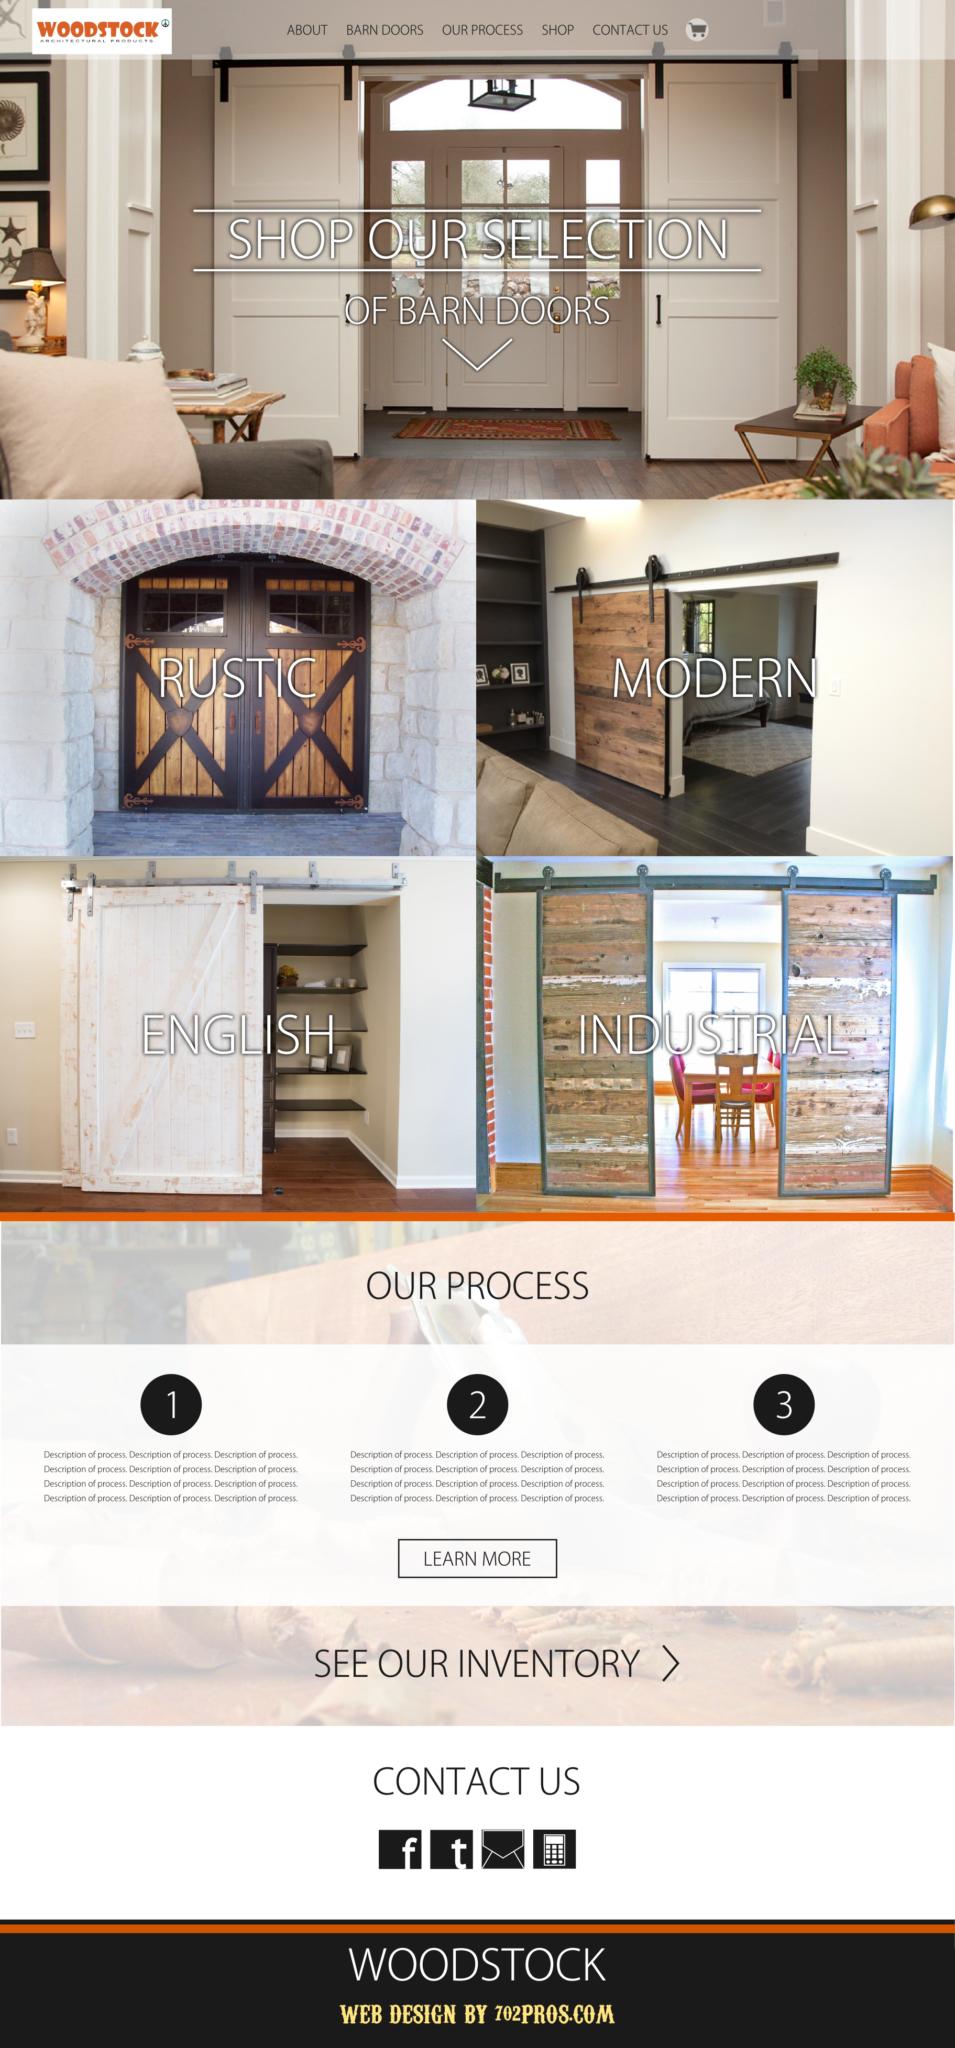 woodstock website design mockup